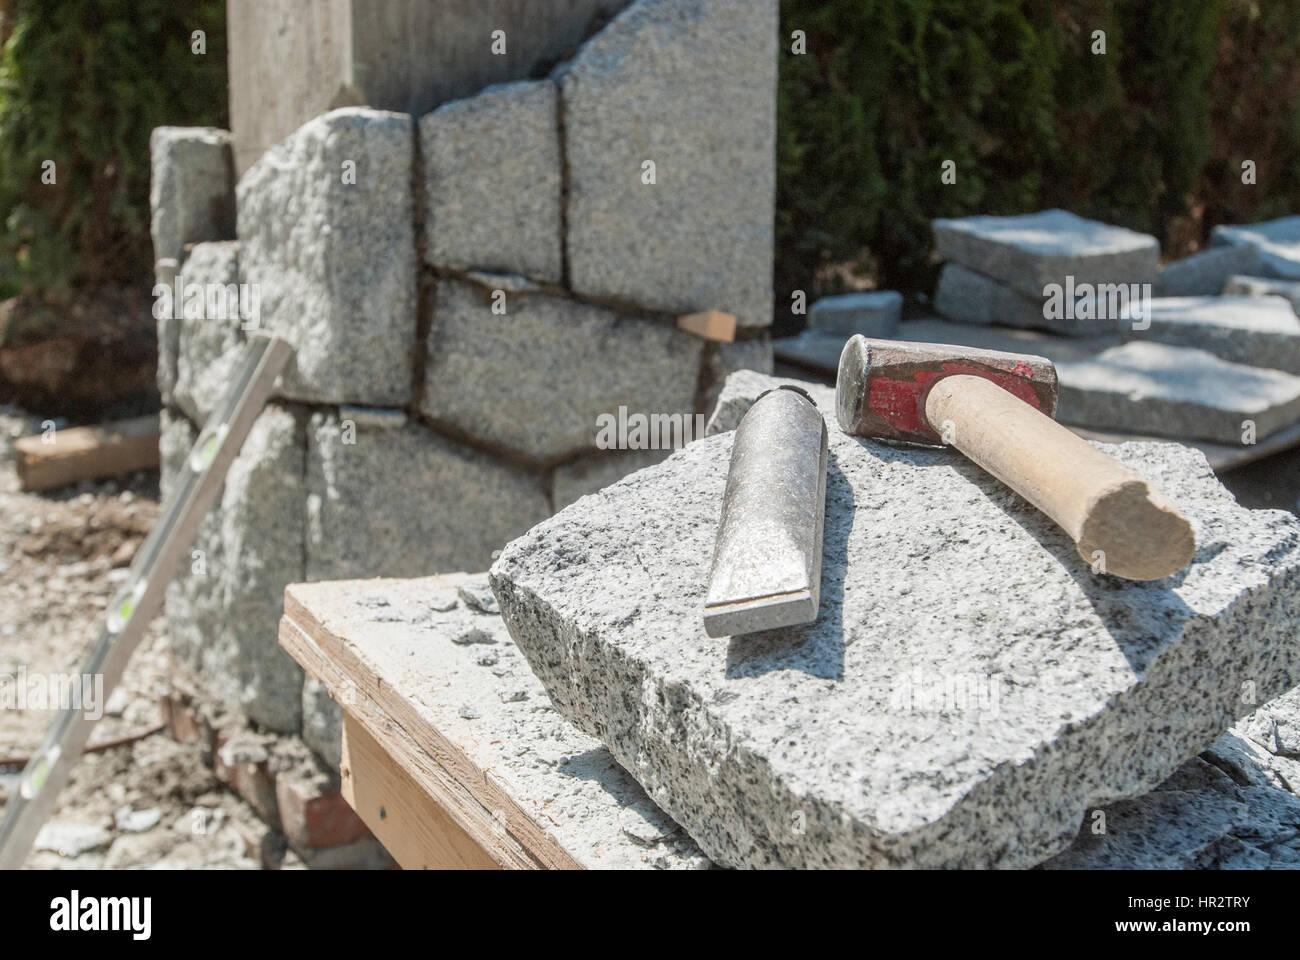 Stone Hammer Stock Photos & Stone Hammer Stock Images - Alamy